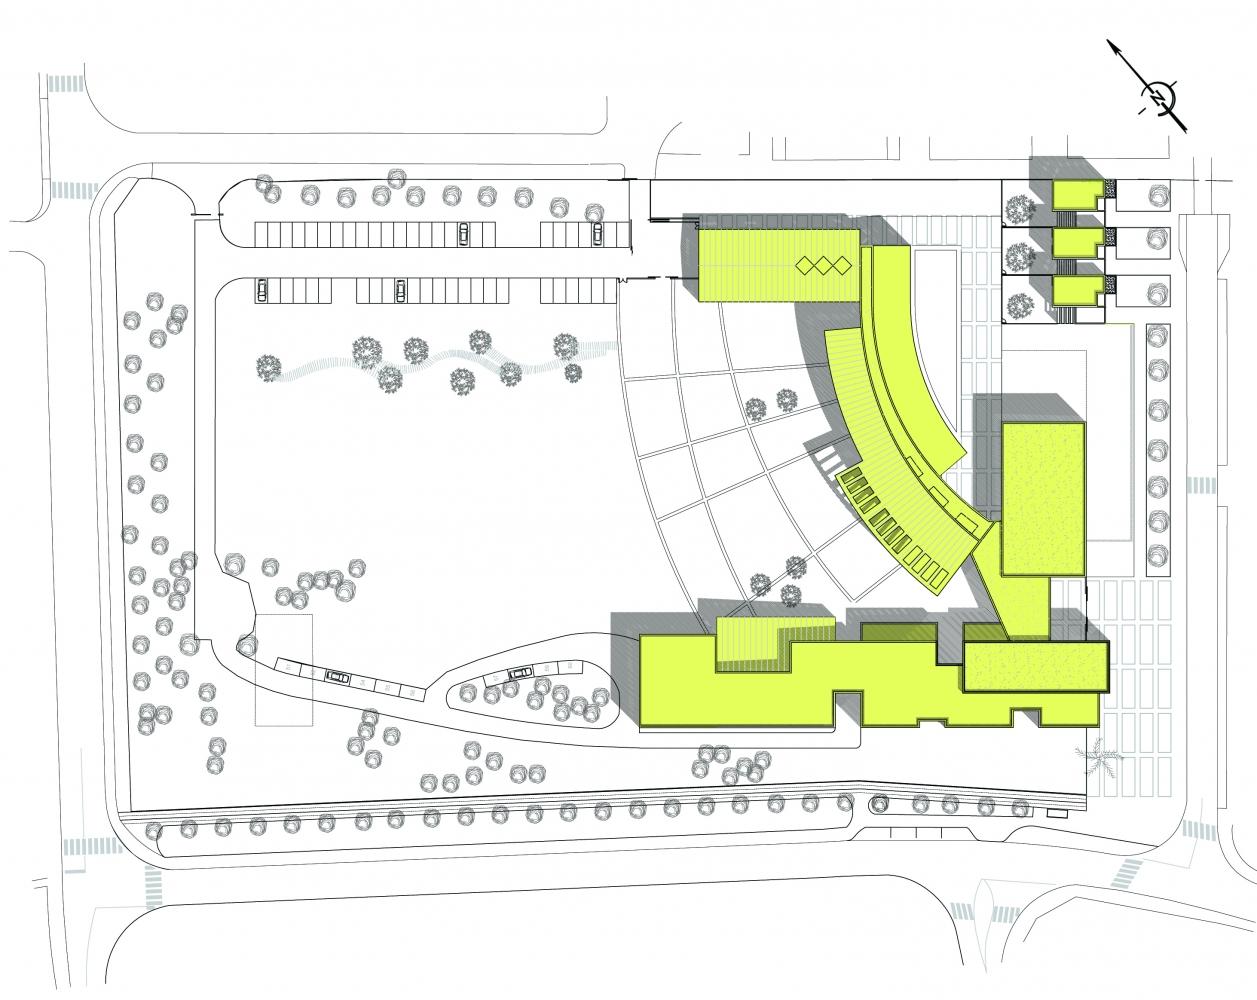 05-blois-img-002 Pascale SEURIN Architecte - Pascale SEURIN Architecte